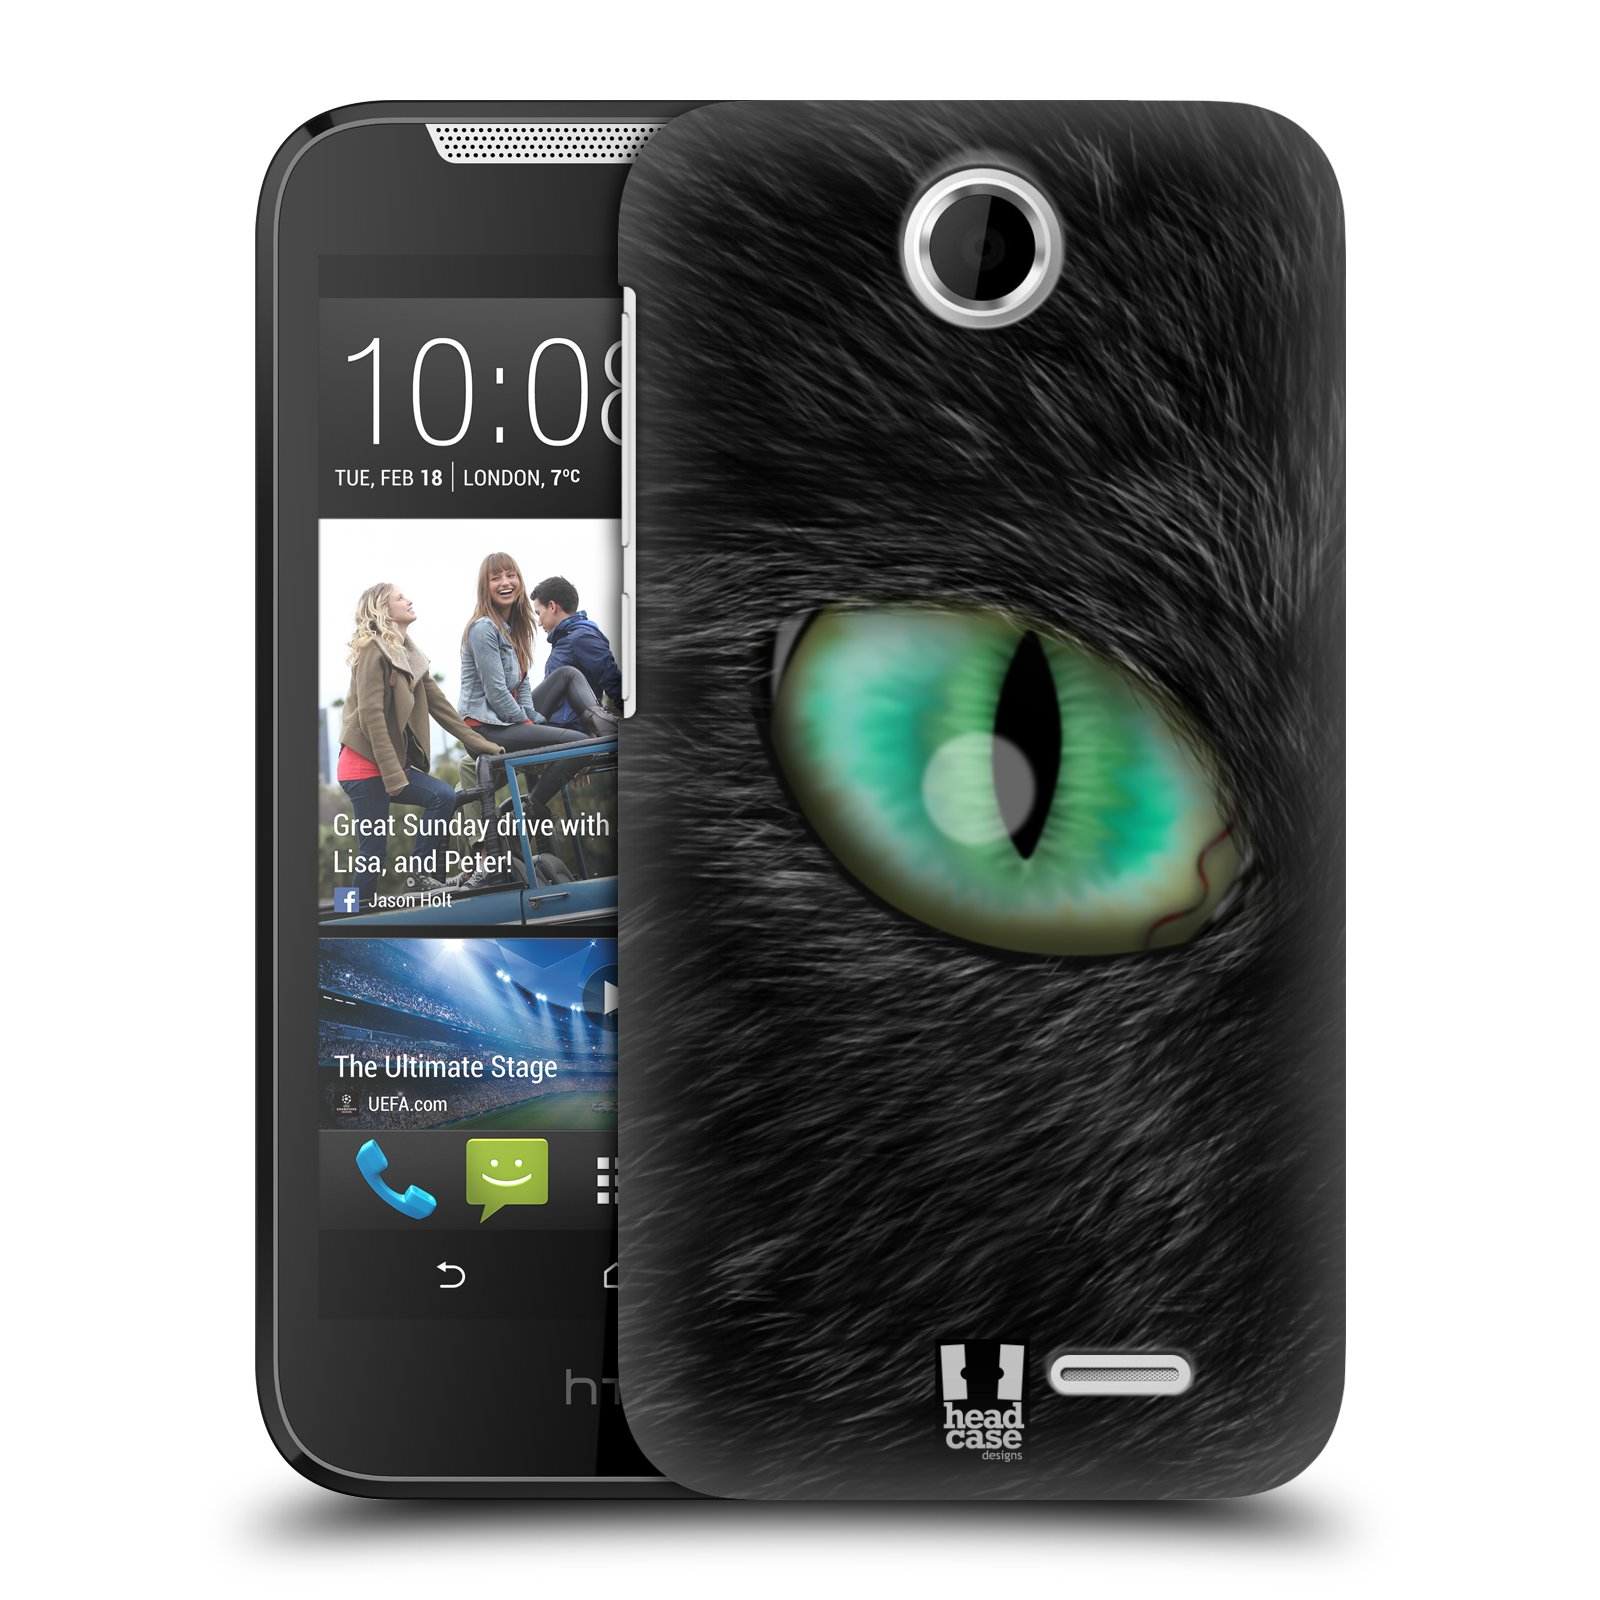 HEAD CASE plastový obal na mobil HTC Desire 310 vzor pohled zvířete oko kočka